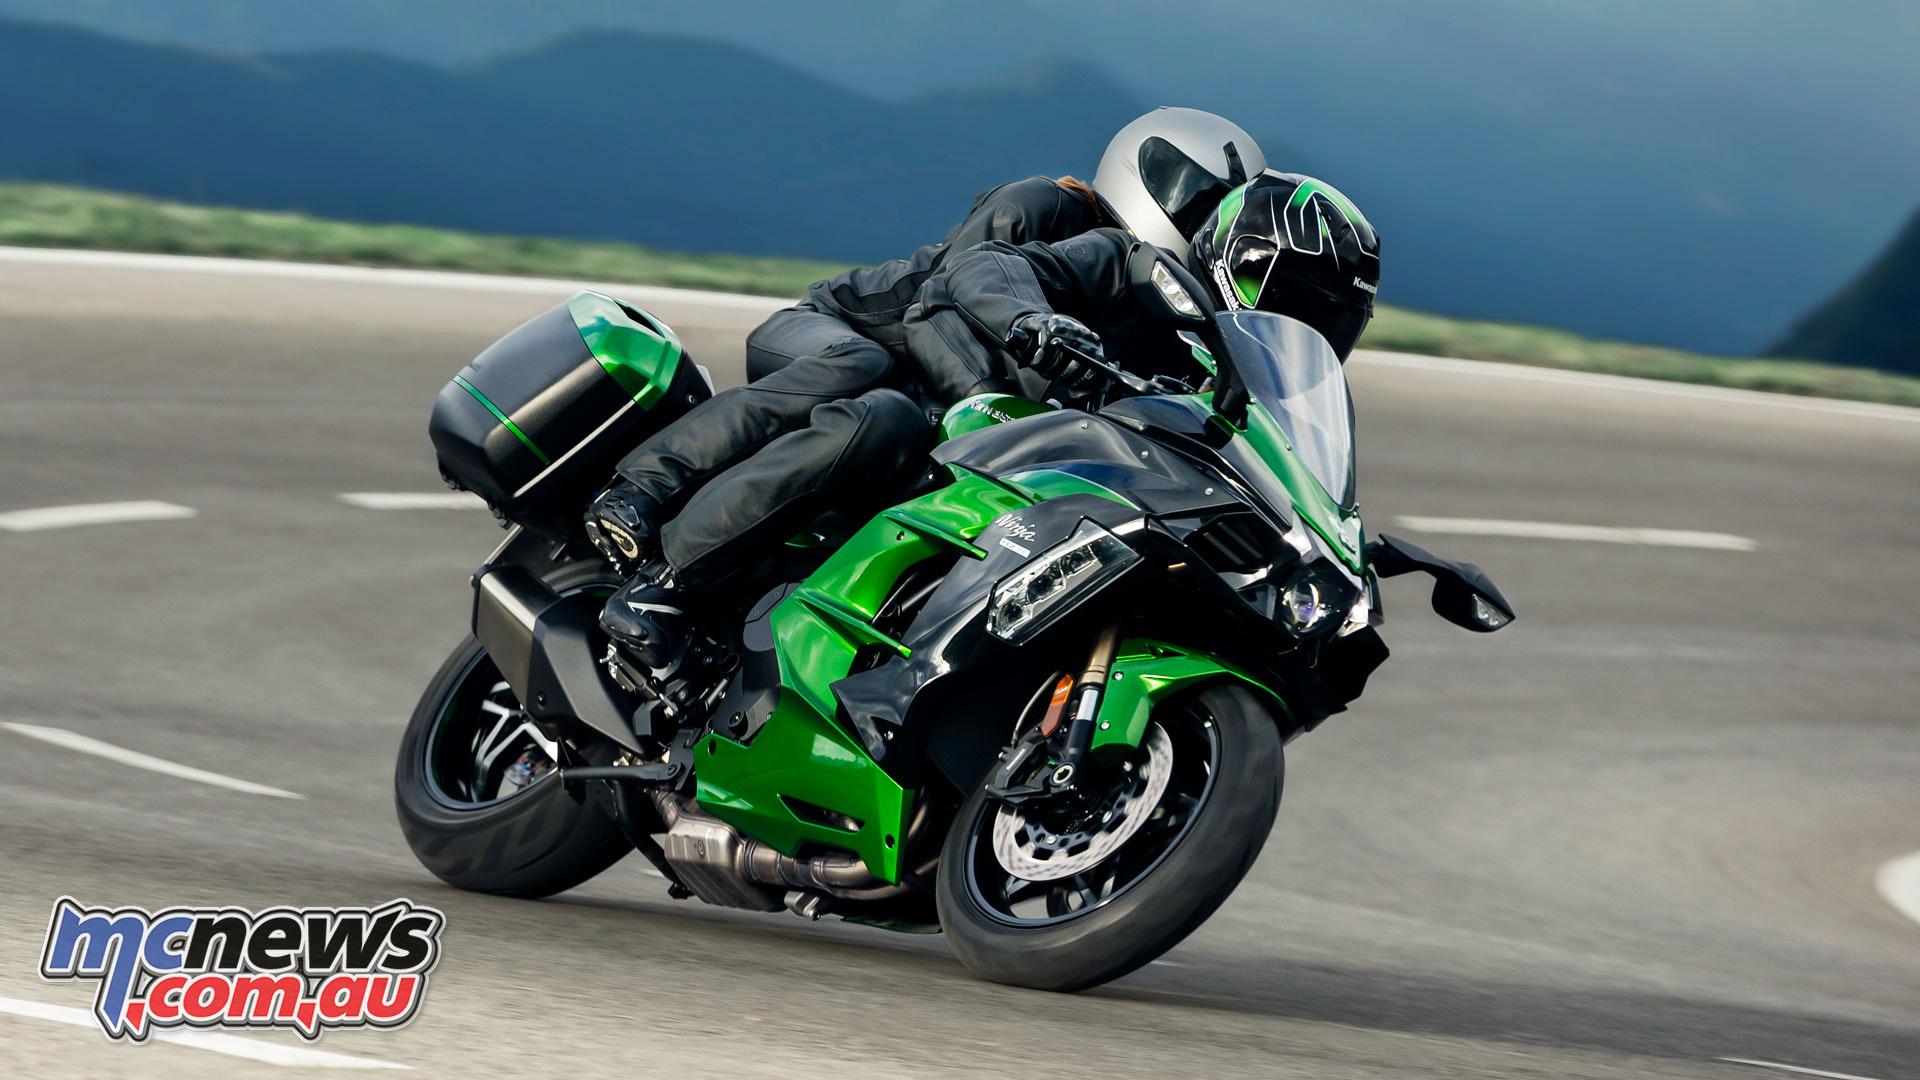 2018 Kawasaki Ninja H2 Sx Se Arrives 34999 Mcnewscomau